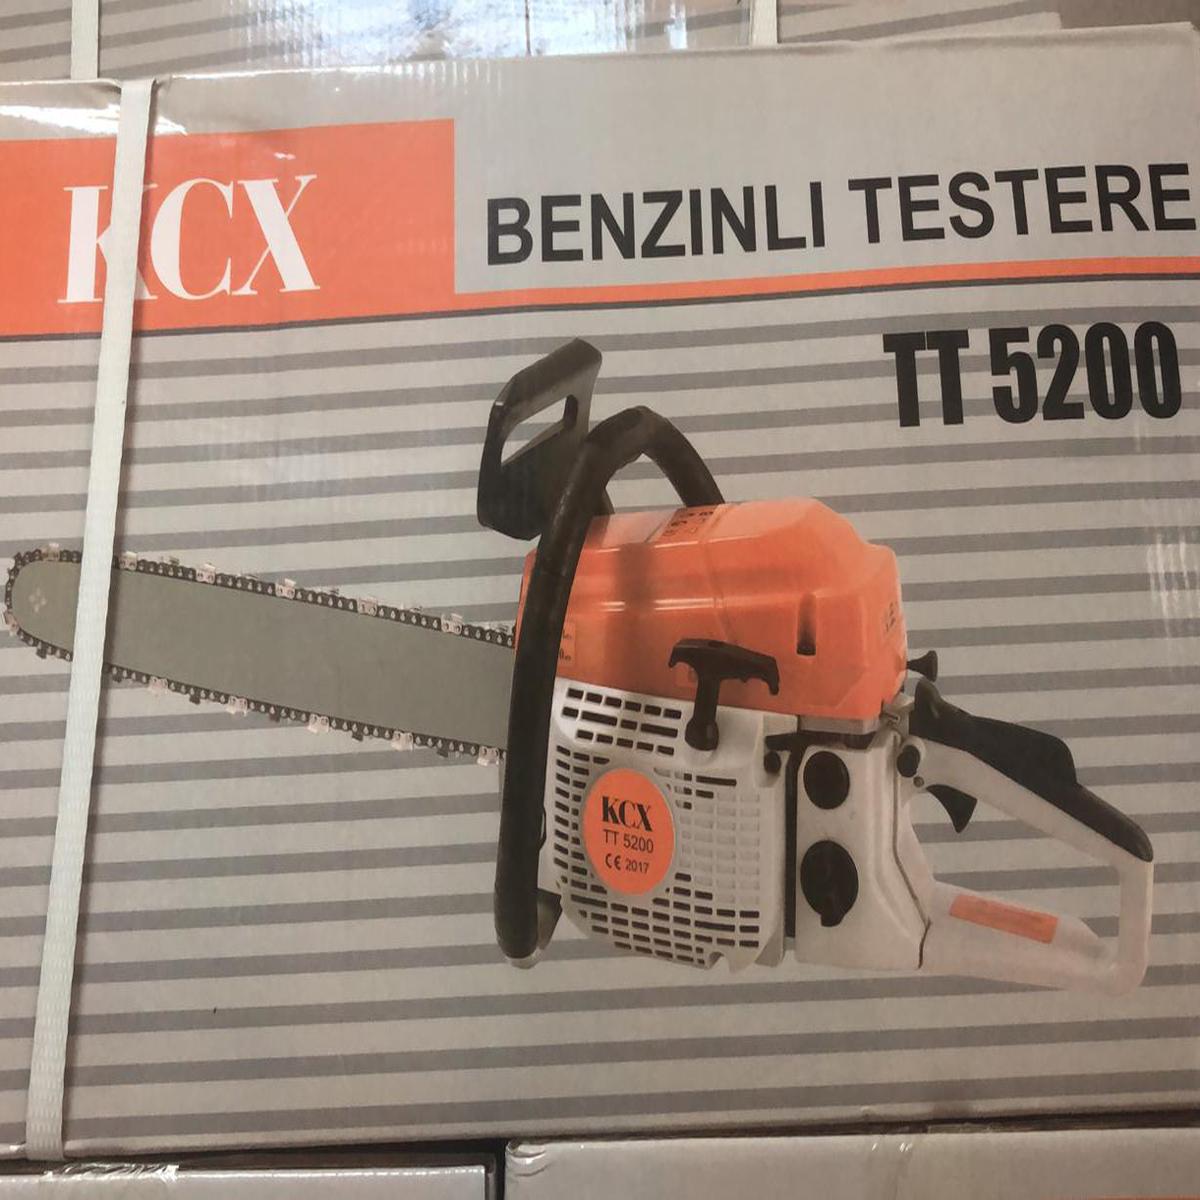 KCX-TT5200_7